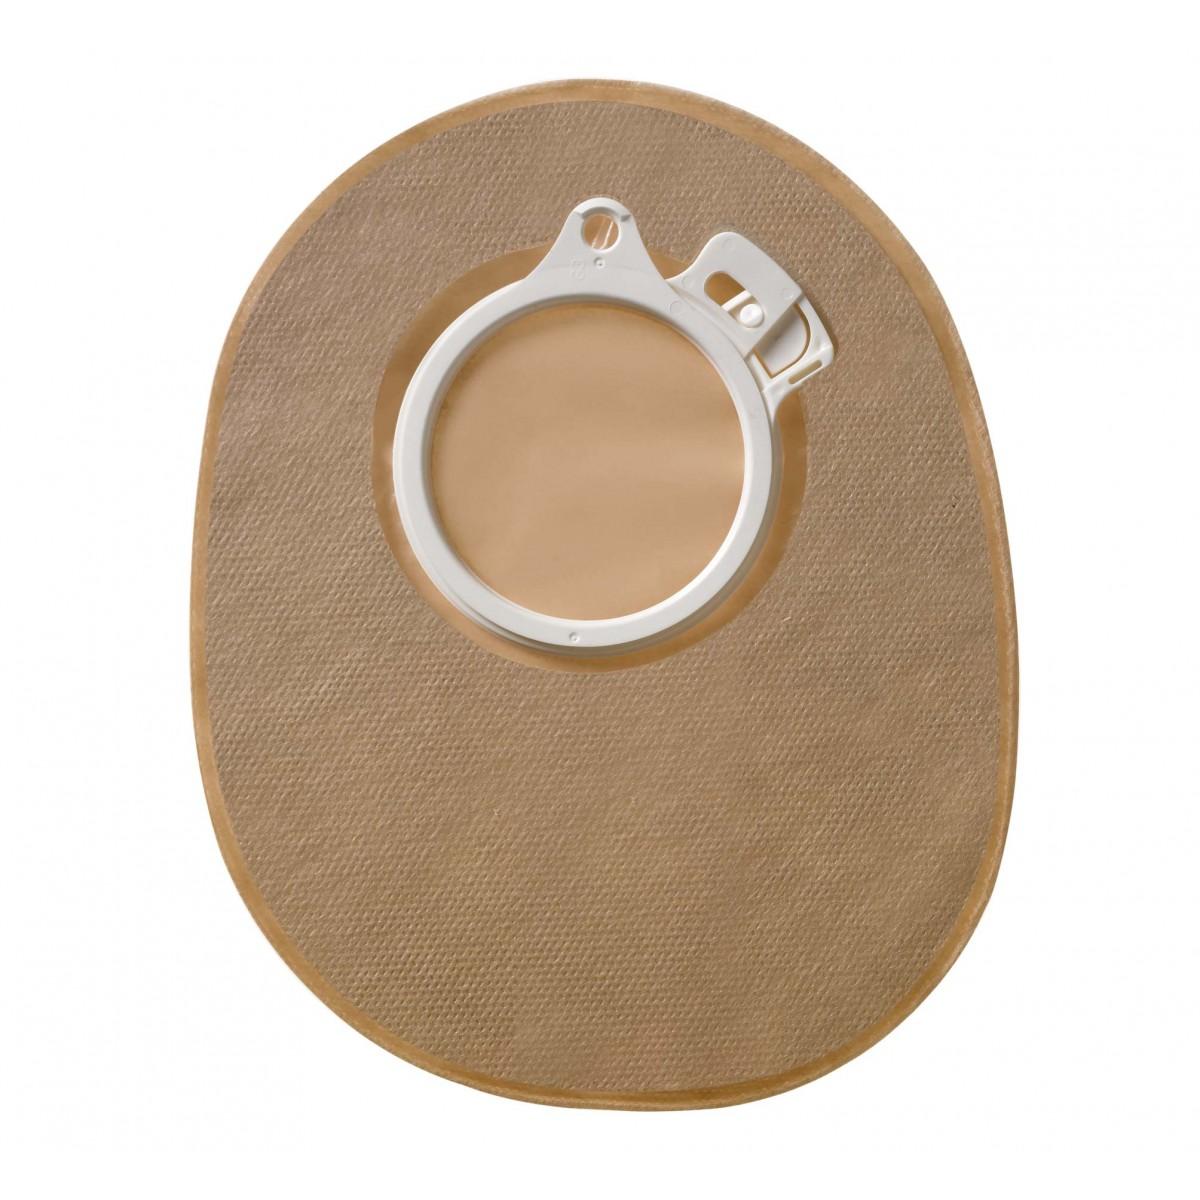 Bolsa 60mm Fechada Opaca Sensura Click 10166 - (Coloplast)